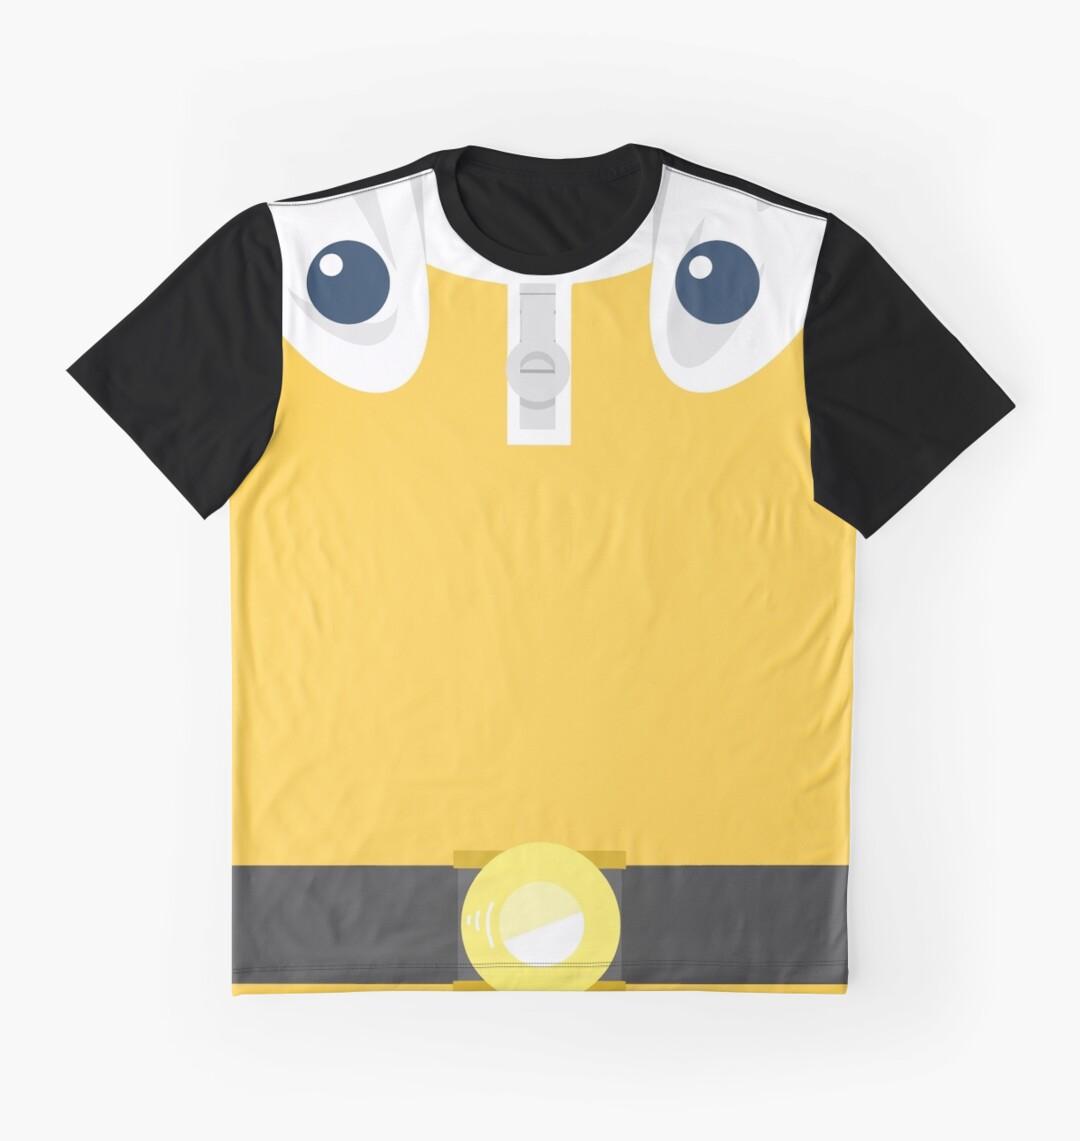 Design shirt redbubble - Saitama The Hero T Shirt Design